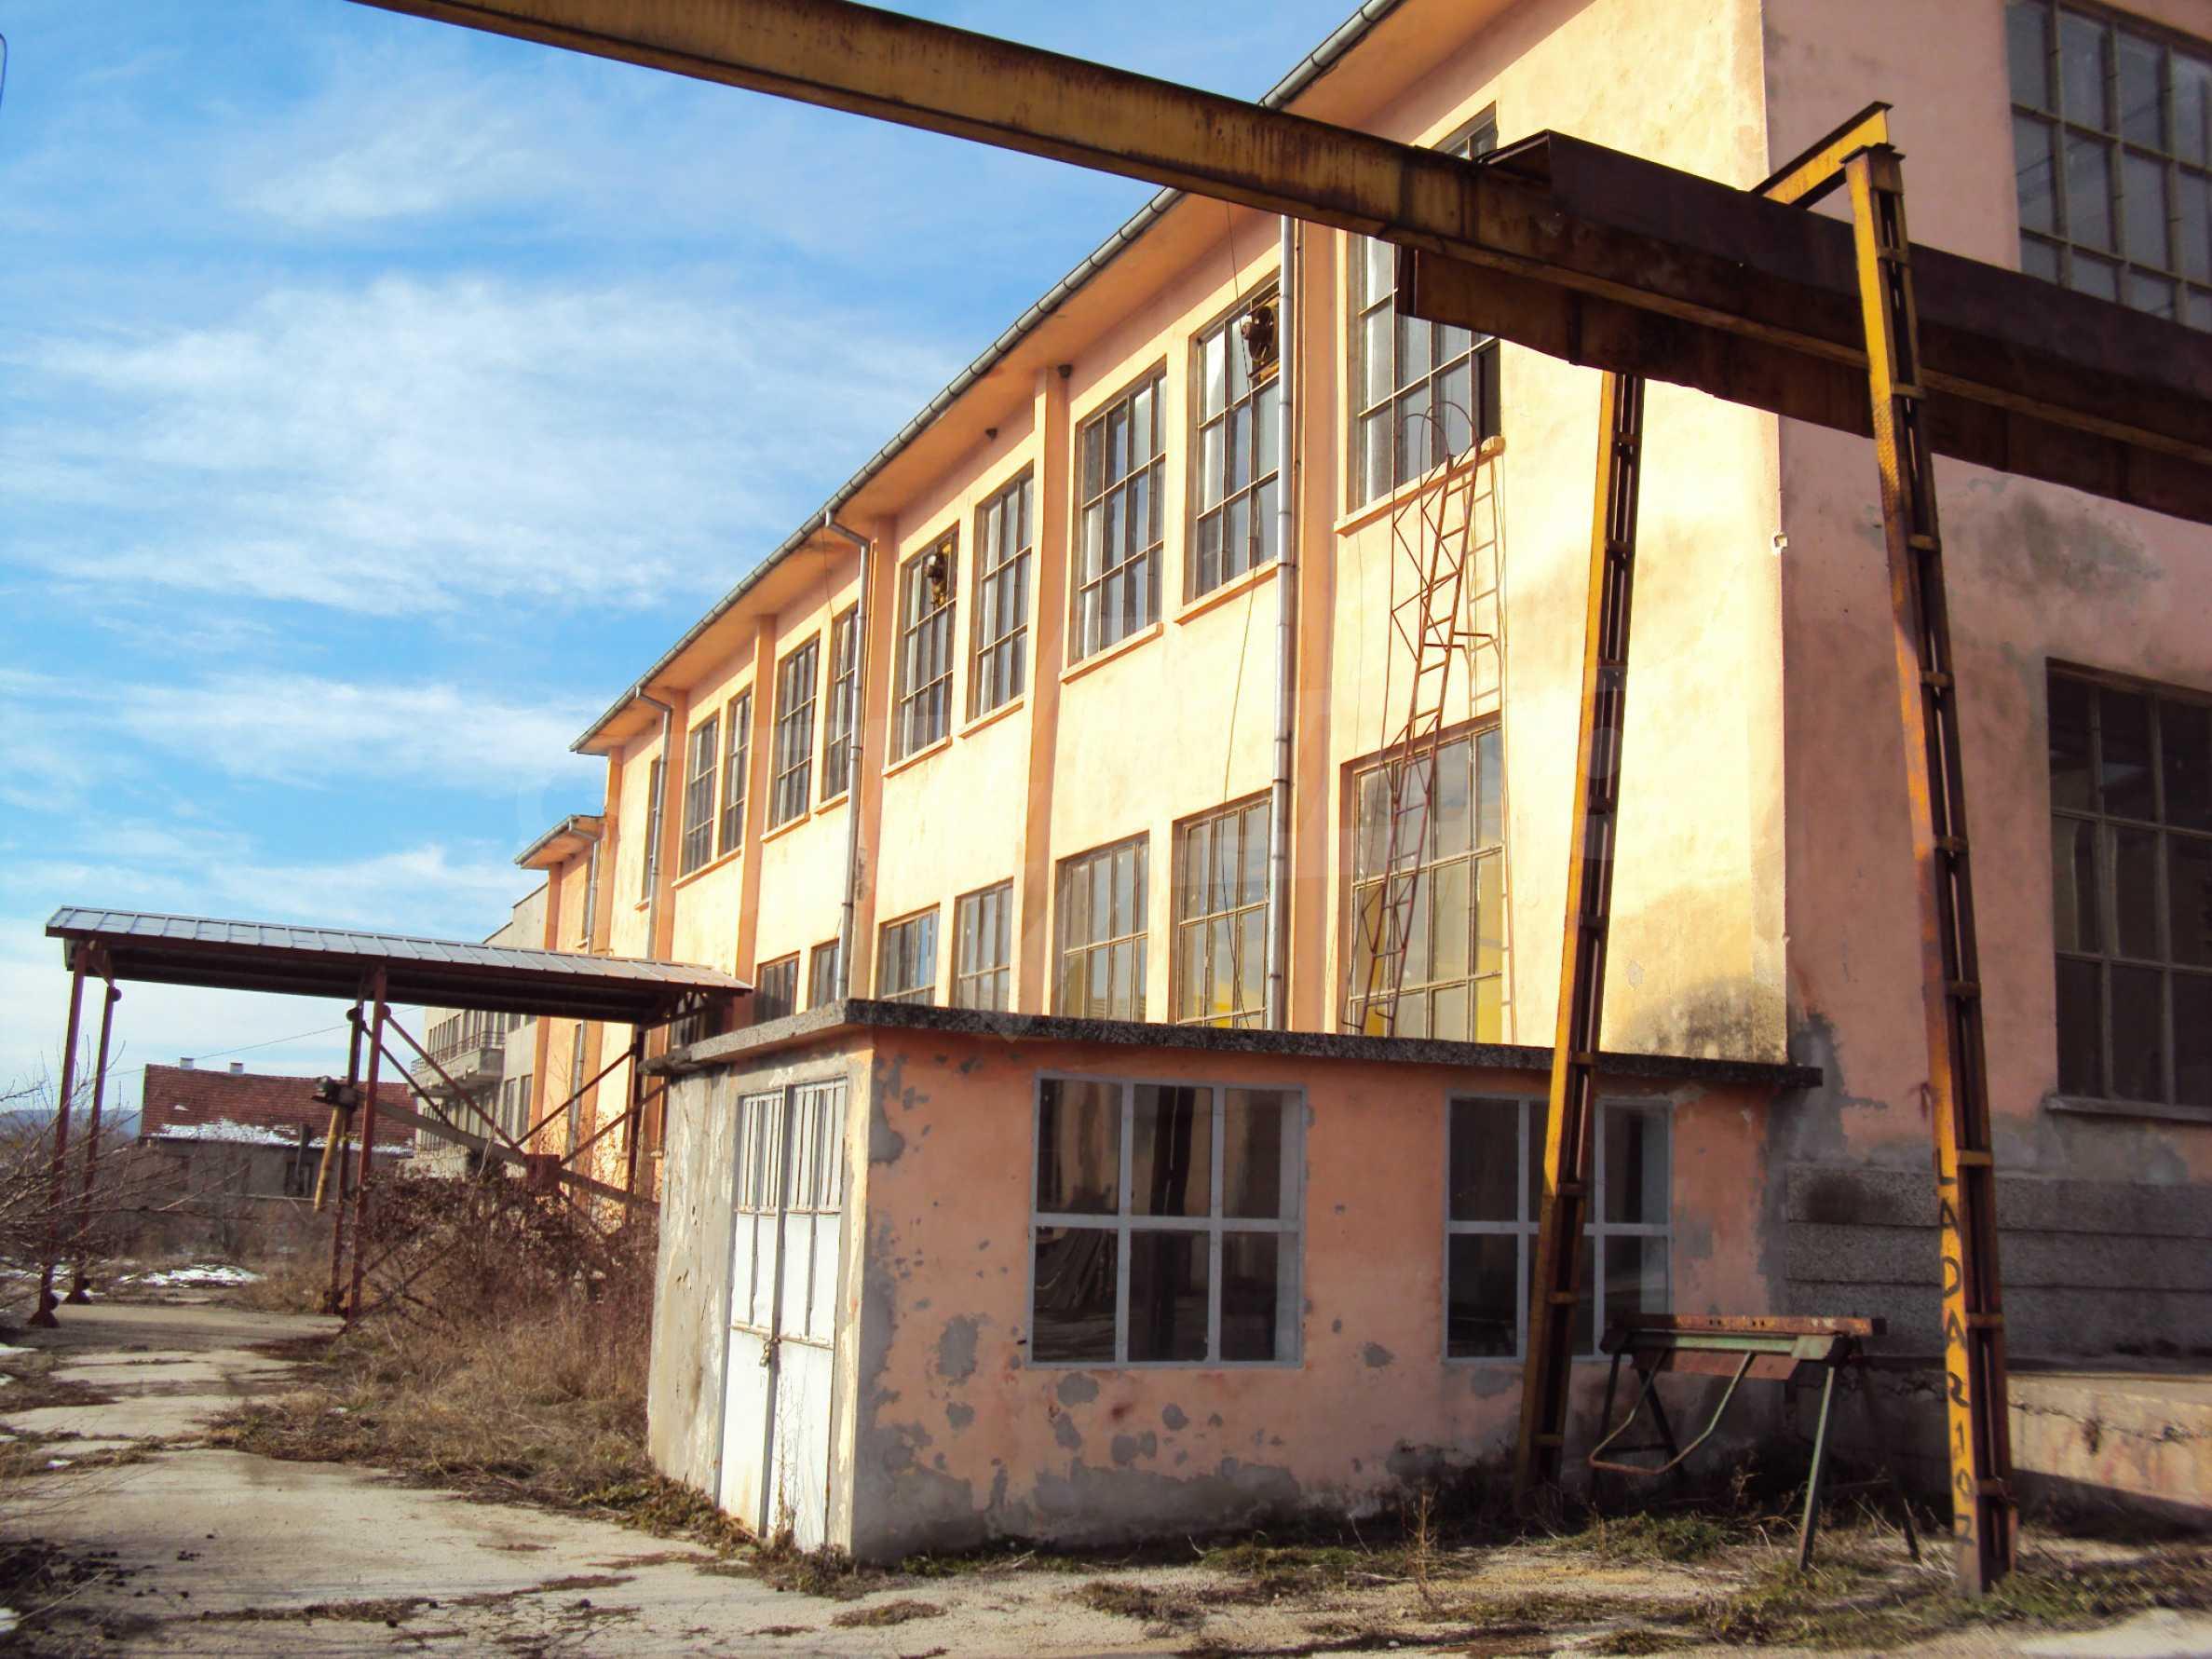 Fabrik in der Nähe von Veliko Tarnovo 29